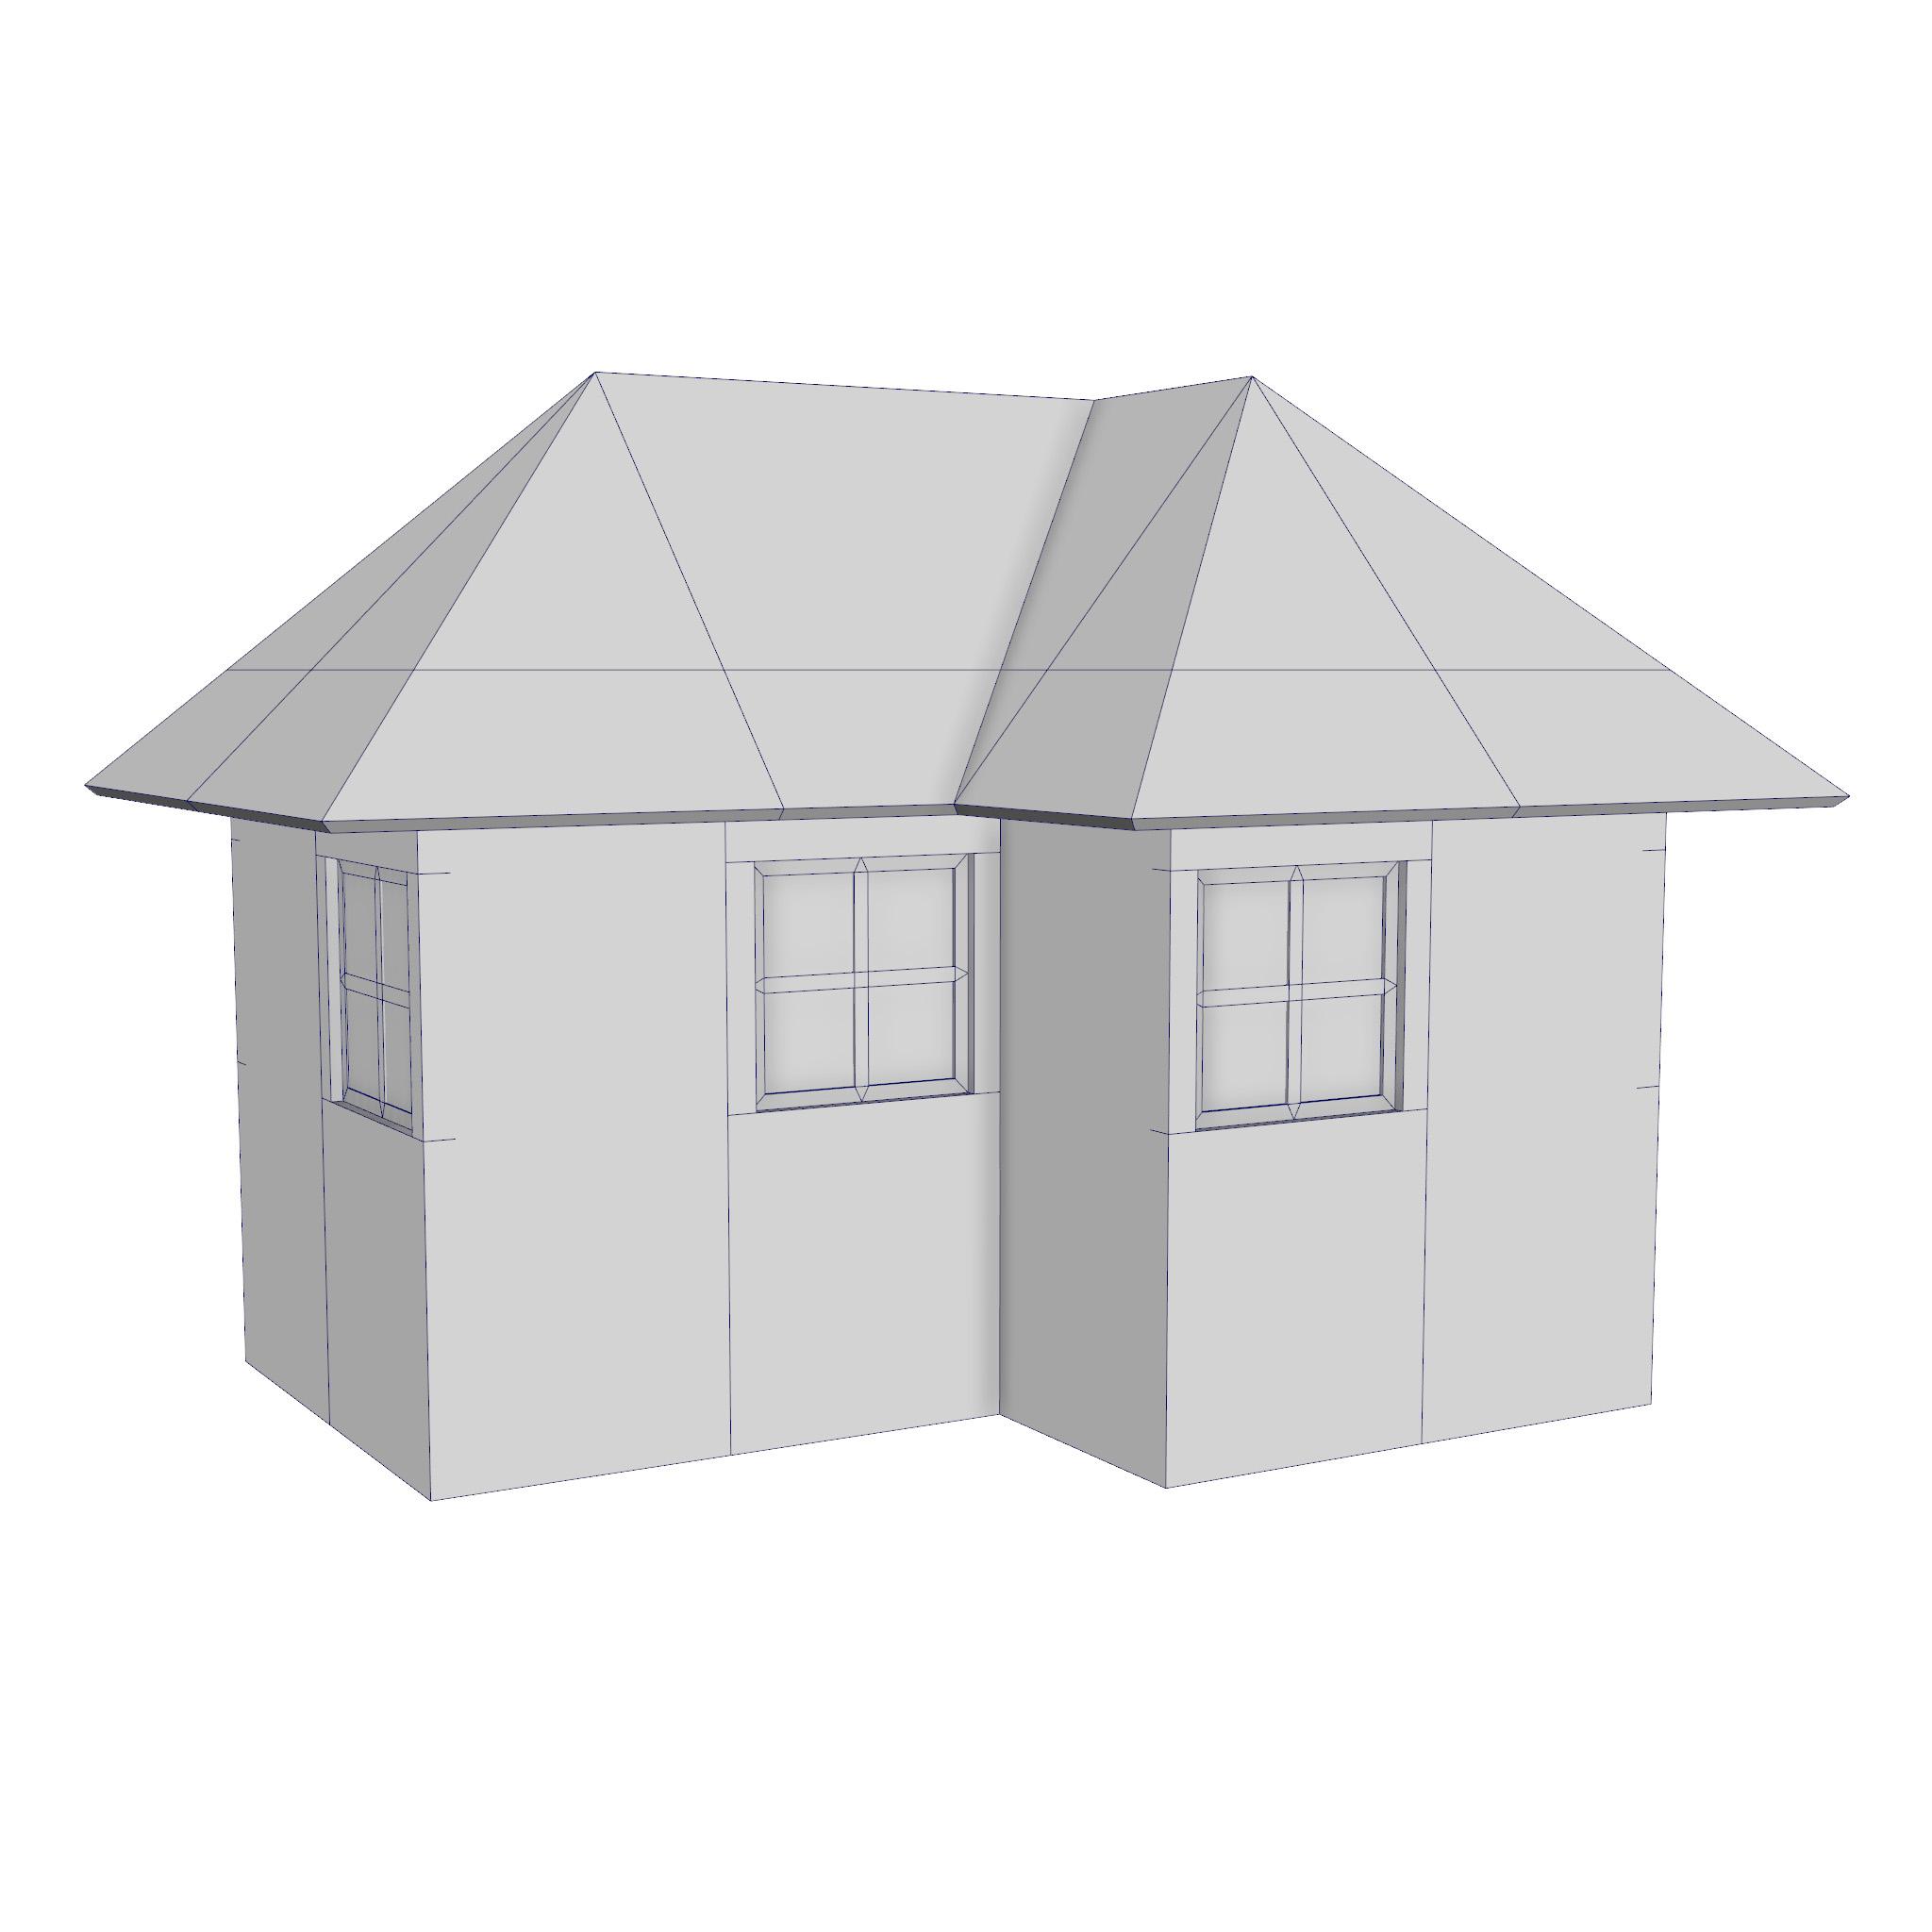 modular brick house set 3d model fbx ma mb 271411